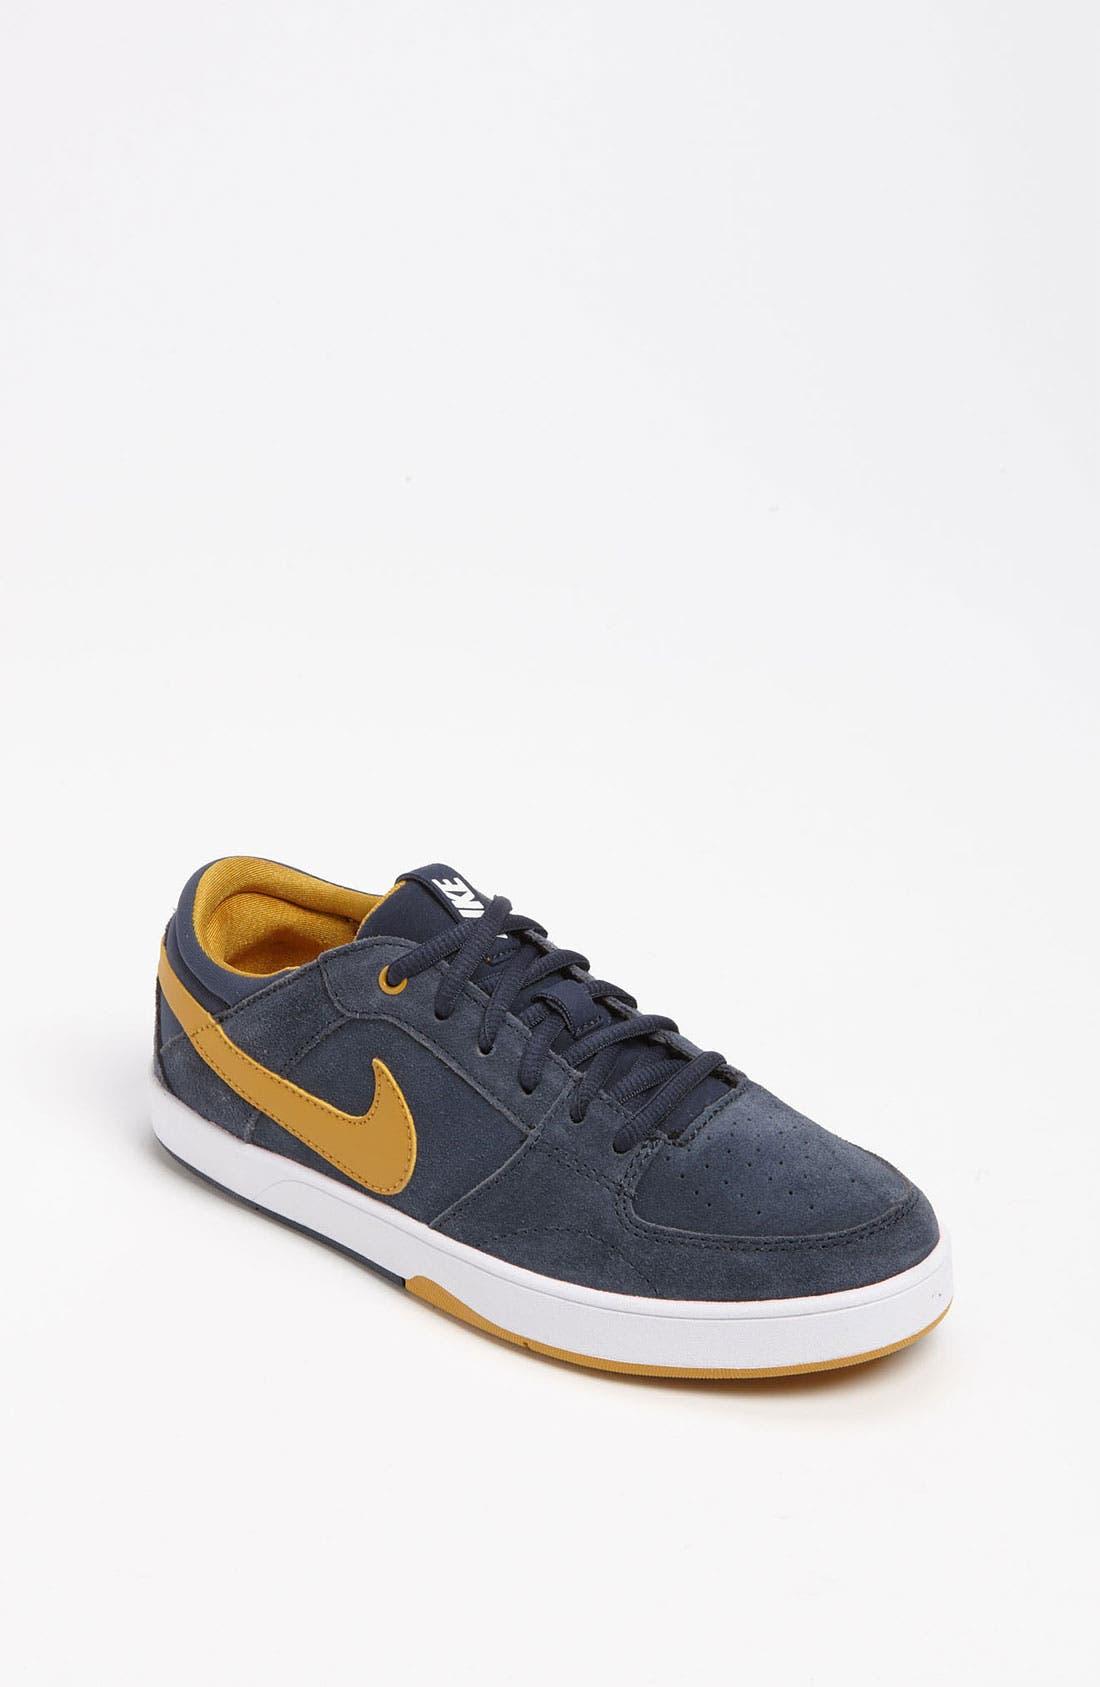 Alternate Image 1 Selected - Nike 'Mavrk 3' Sneaker (Toddler, Little Kid & Big Kid)